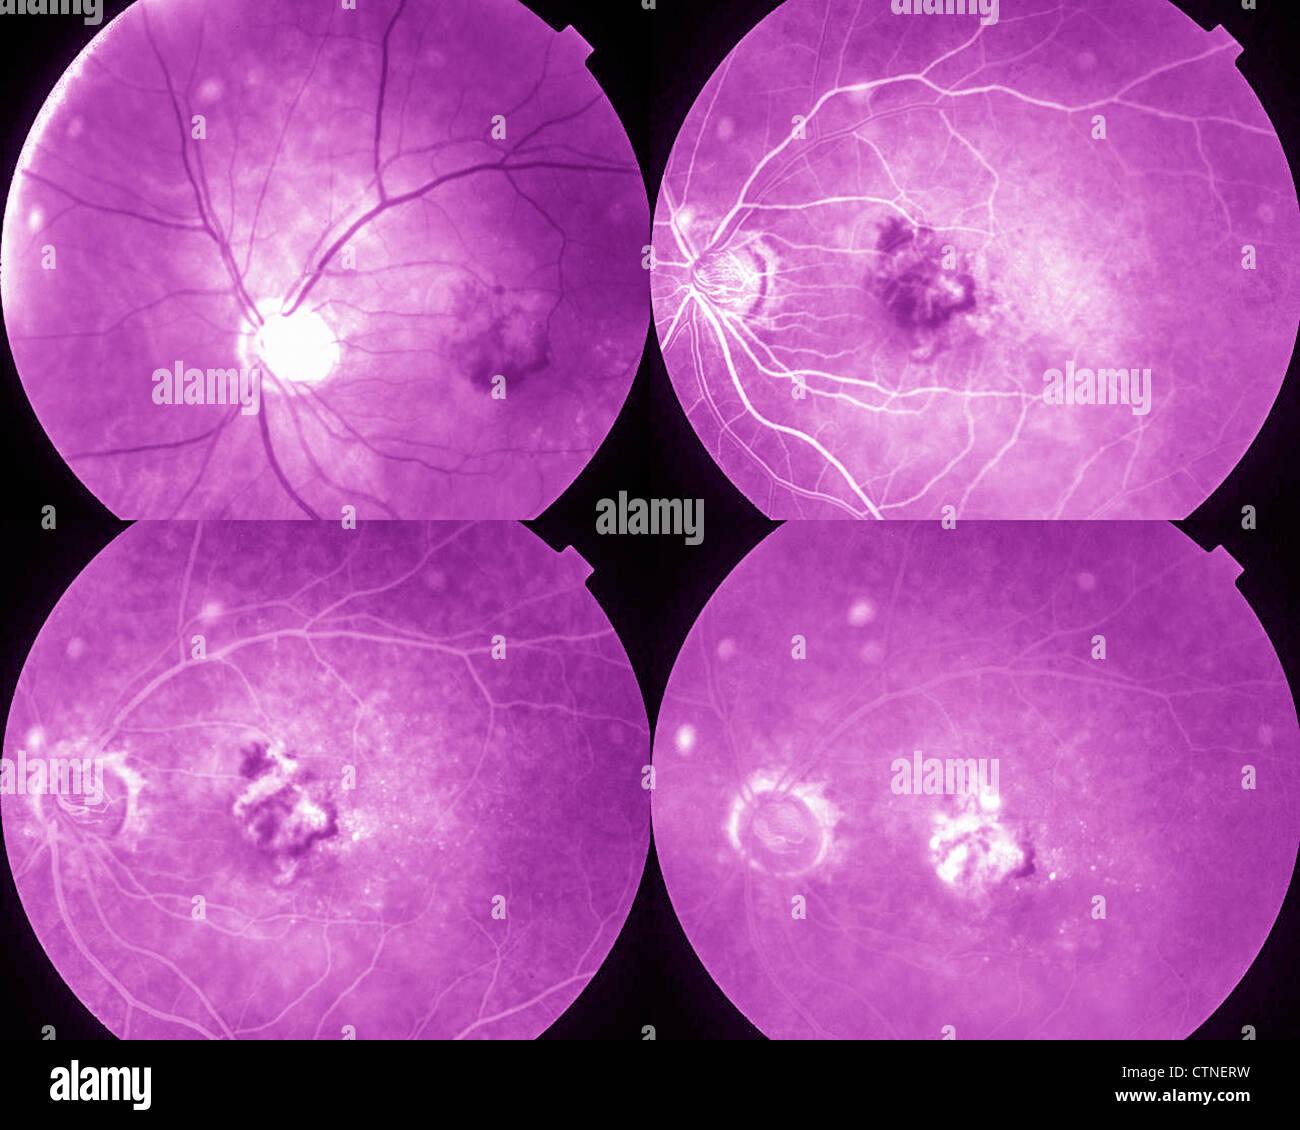 Four phases eye angiography showing AMD age-related macular degeneration - Stock Image